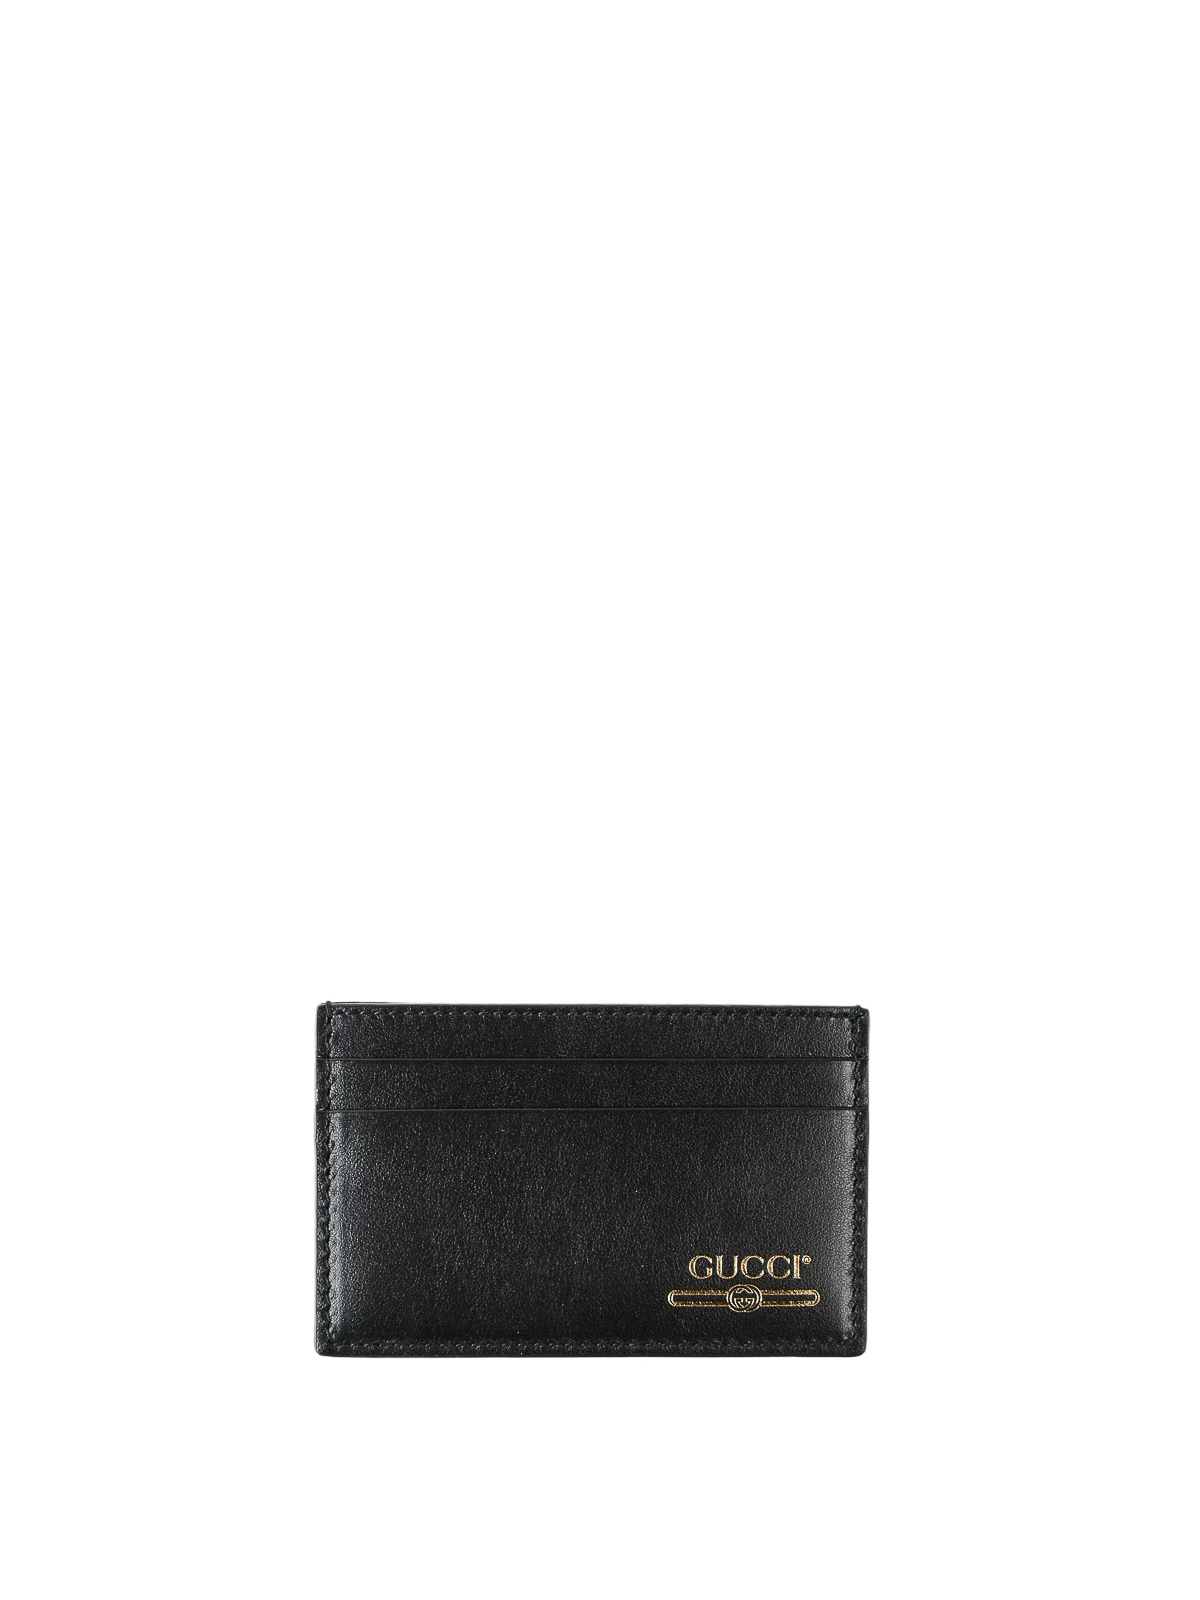 97f5d8da4428 Gucci - Gucci vintage logo print card case - wallets & purses ...